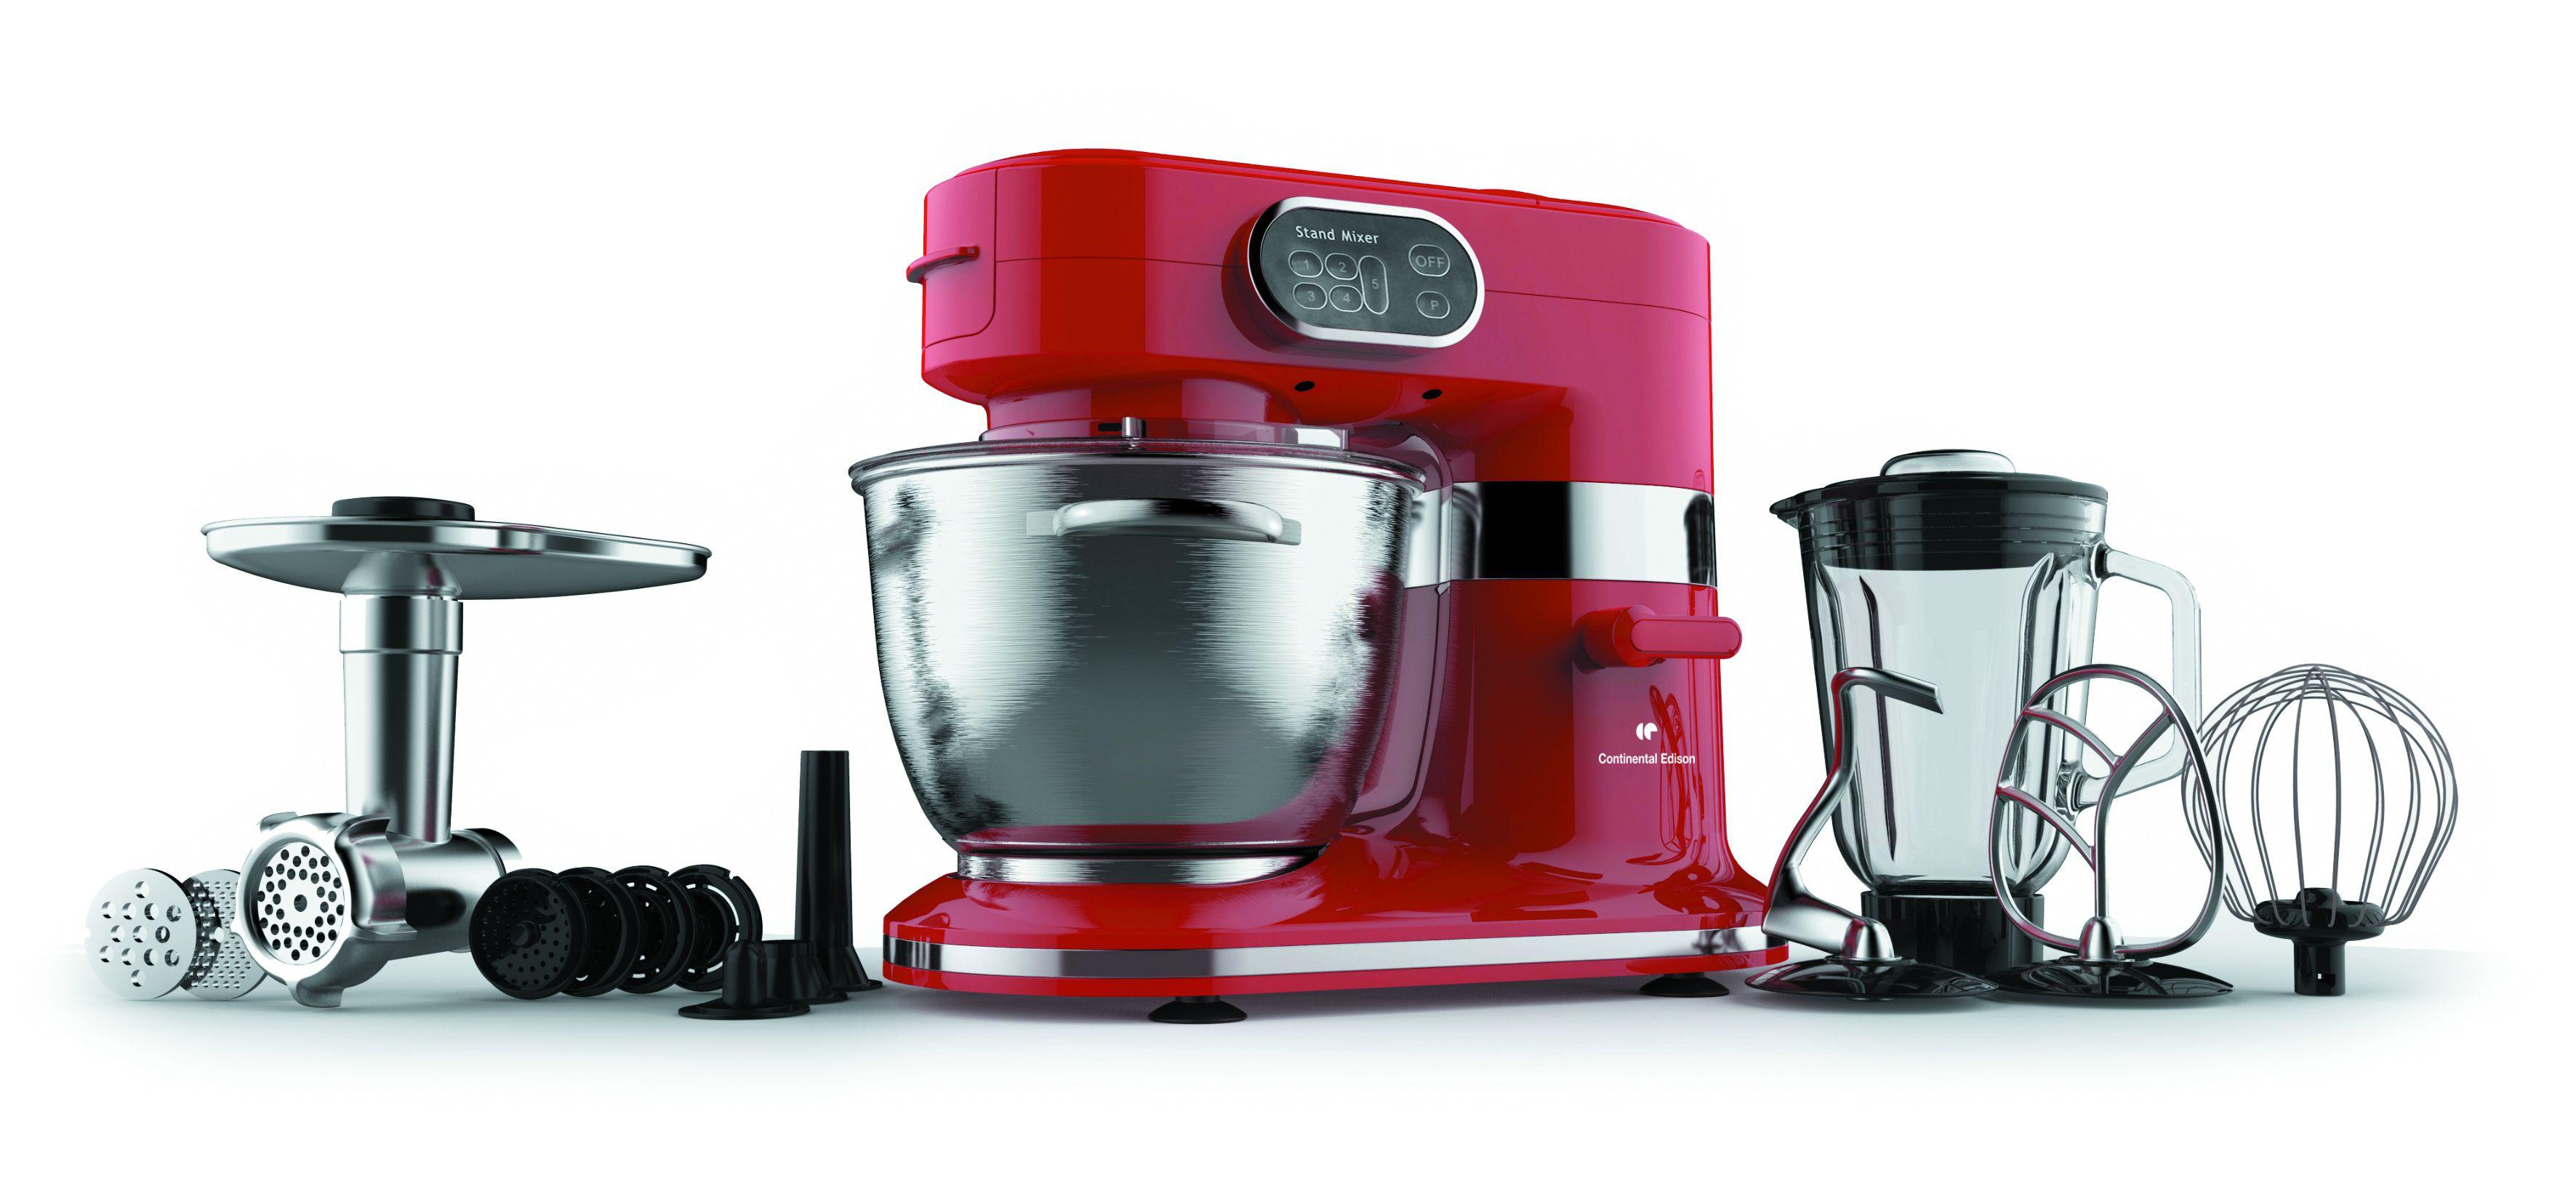 Continental edison robot professionnel cerb100wr 1000 w for Accessoire cuisine professionnel